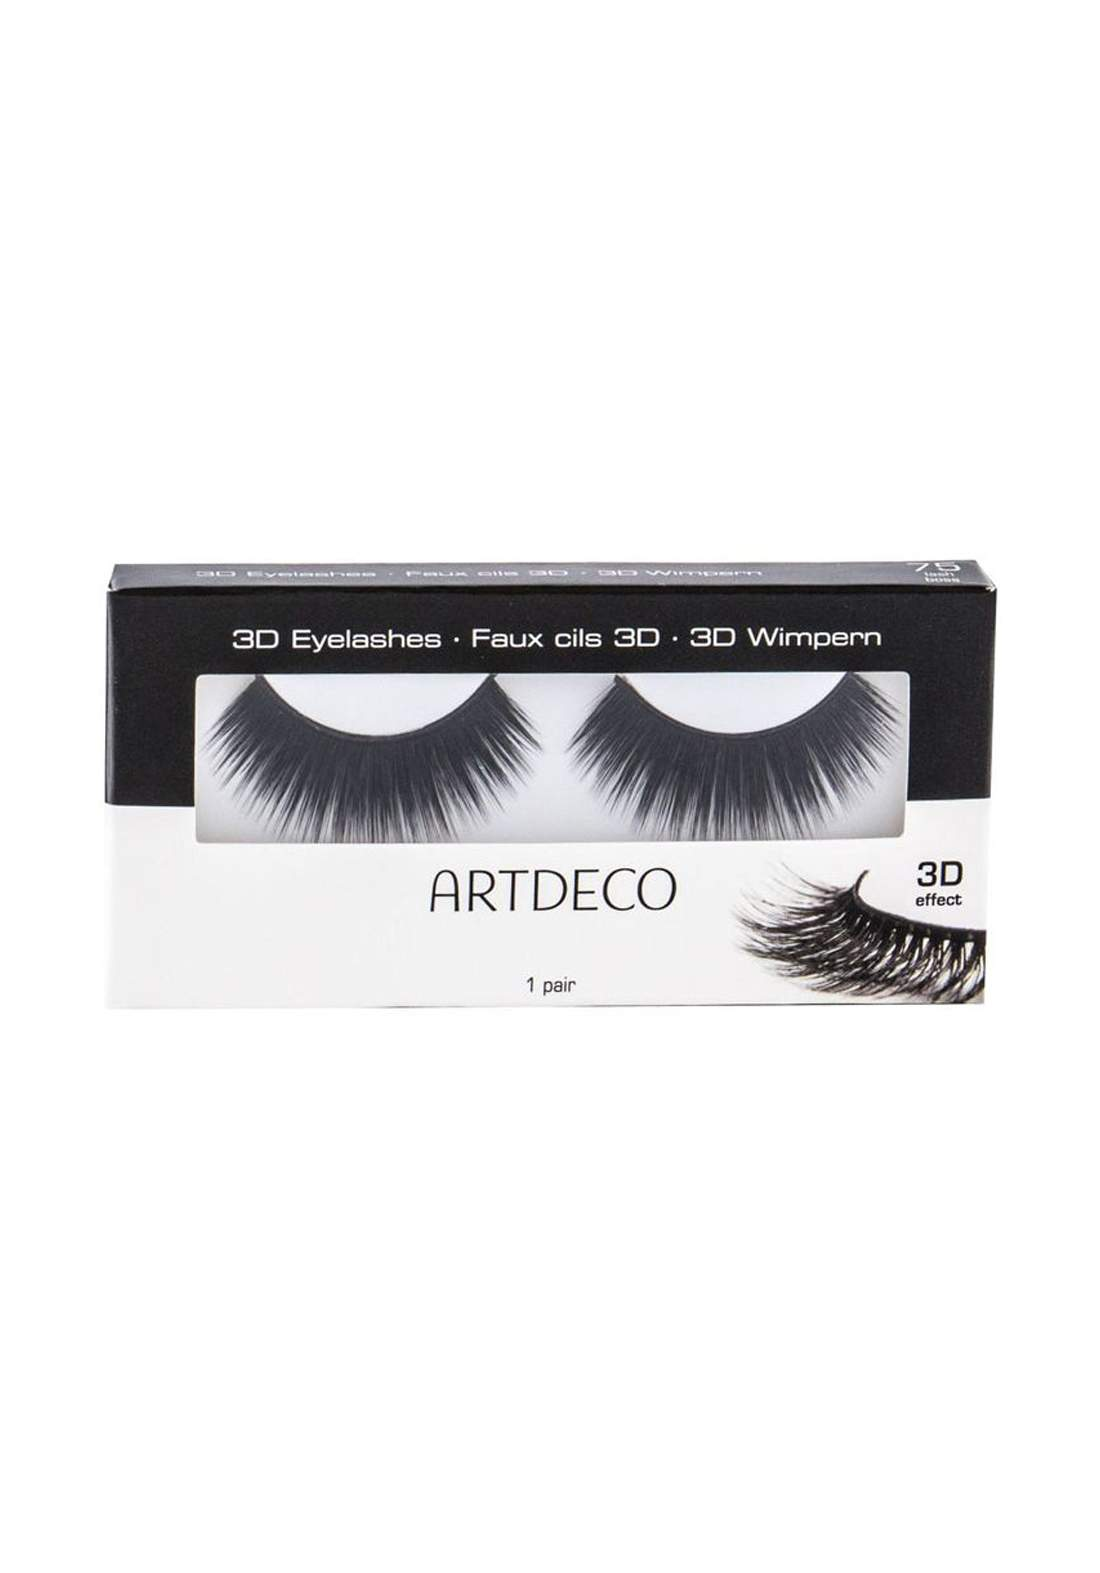 Artdeco 3D Eyelashes (1ml) (75 Lash Boss) رموش